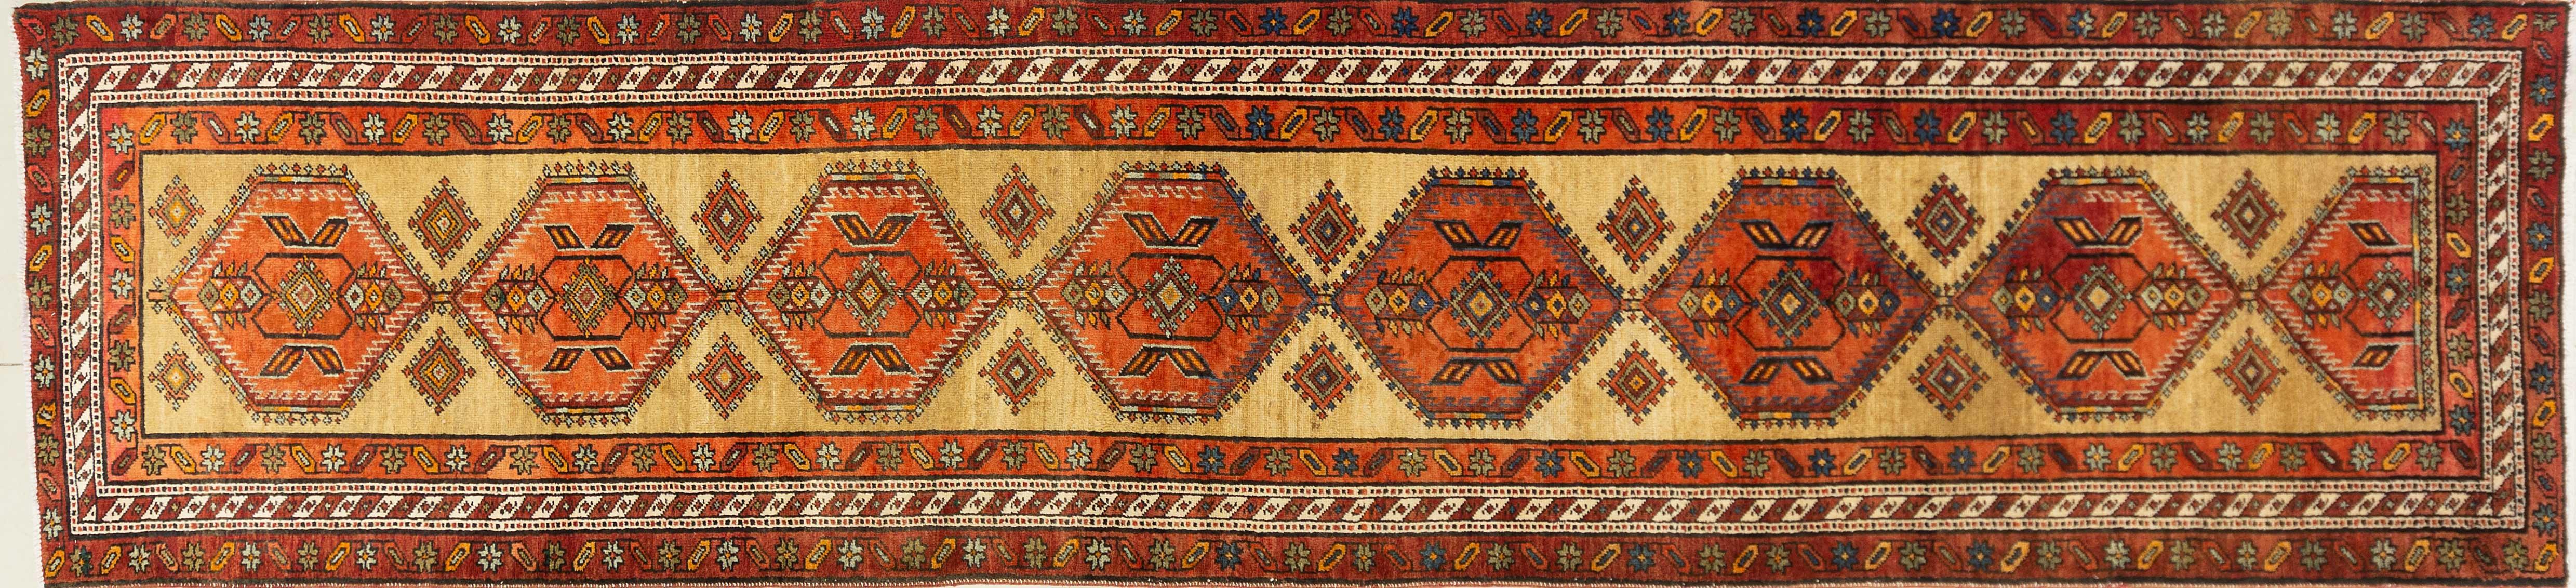 A Persian Hand Knotted Azari Runner, 437 x 103